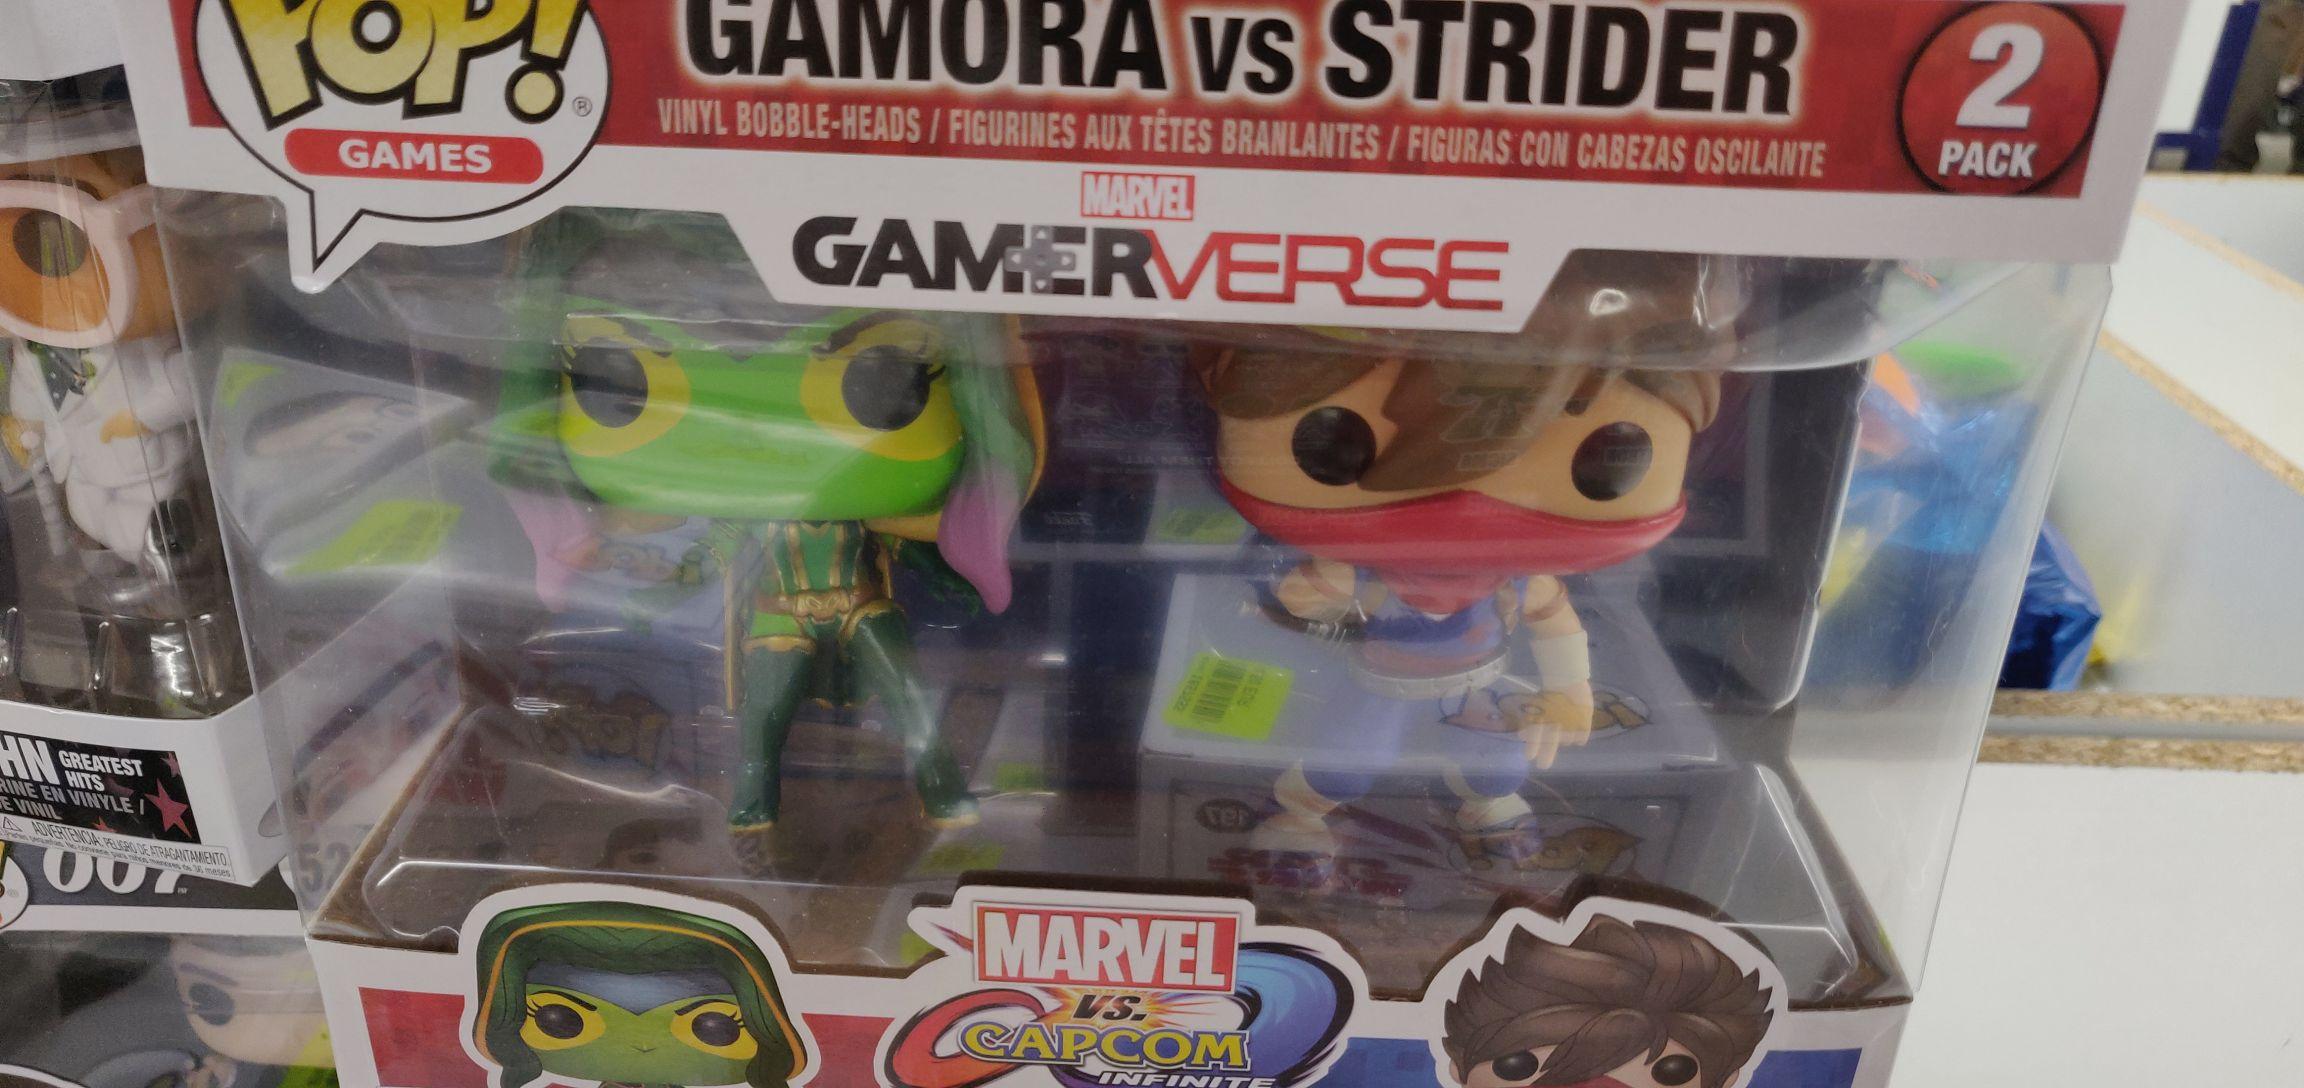 Pack de 2 Figurines Funko Pop! Marvel: Gamora vs Strider (Redon 35)